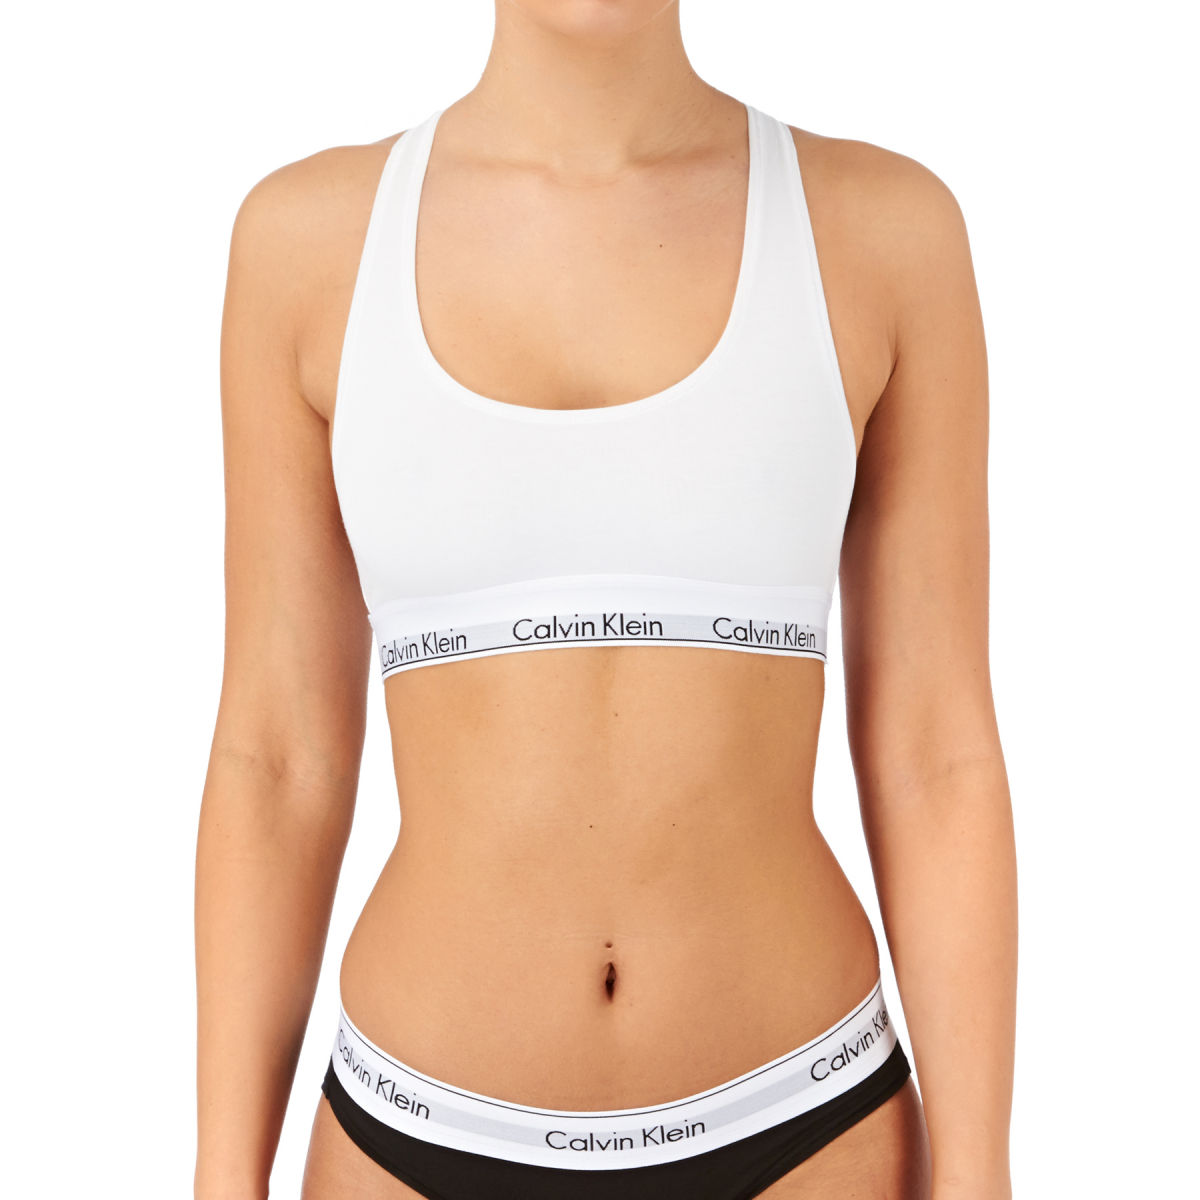 f91b56f154f Calvin Klein Modern Cotton Bralet Sports Bra - White